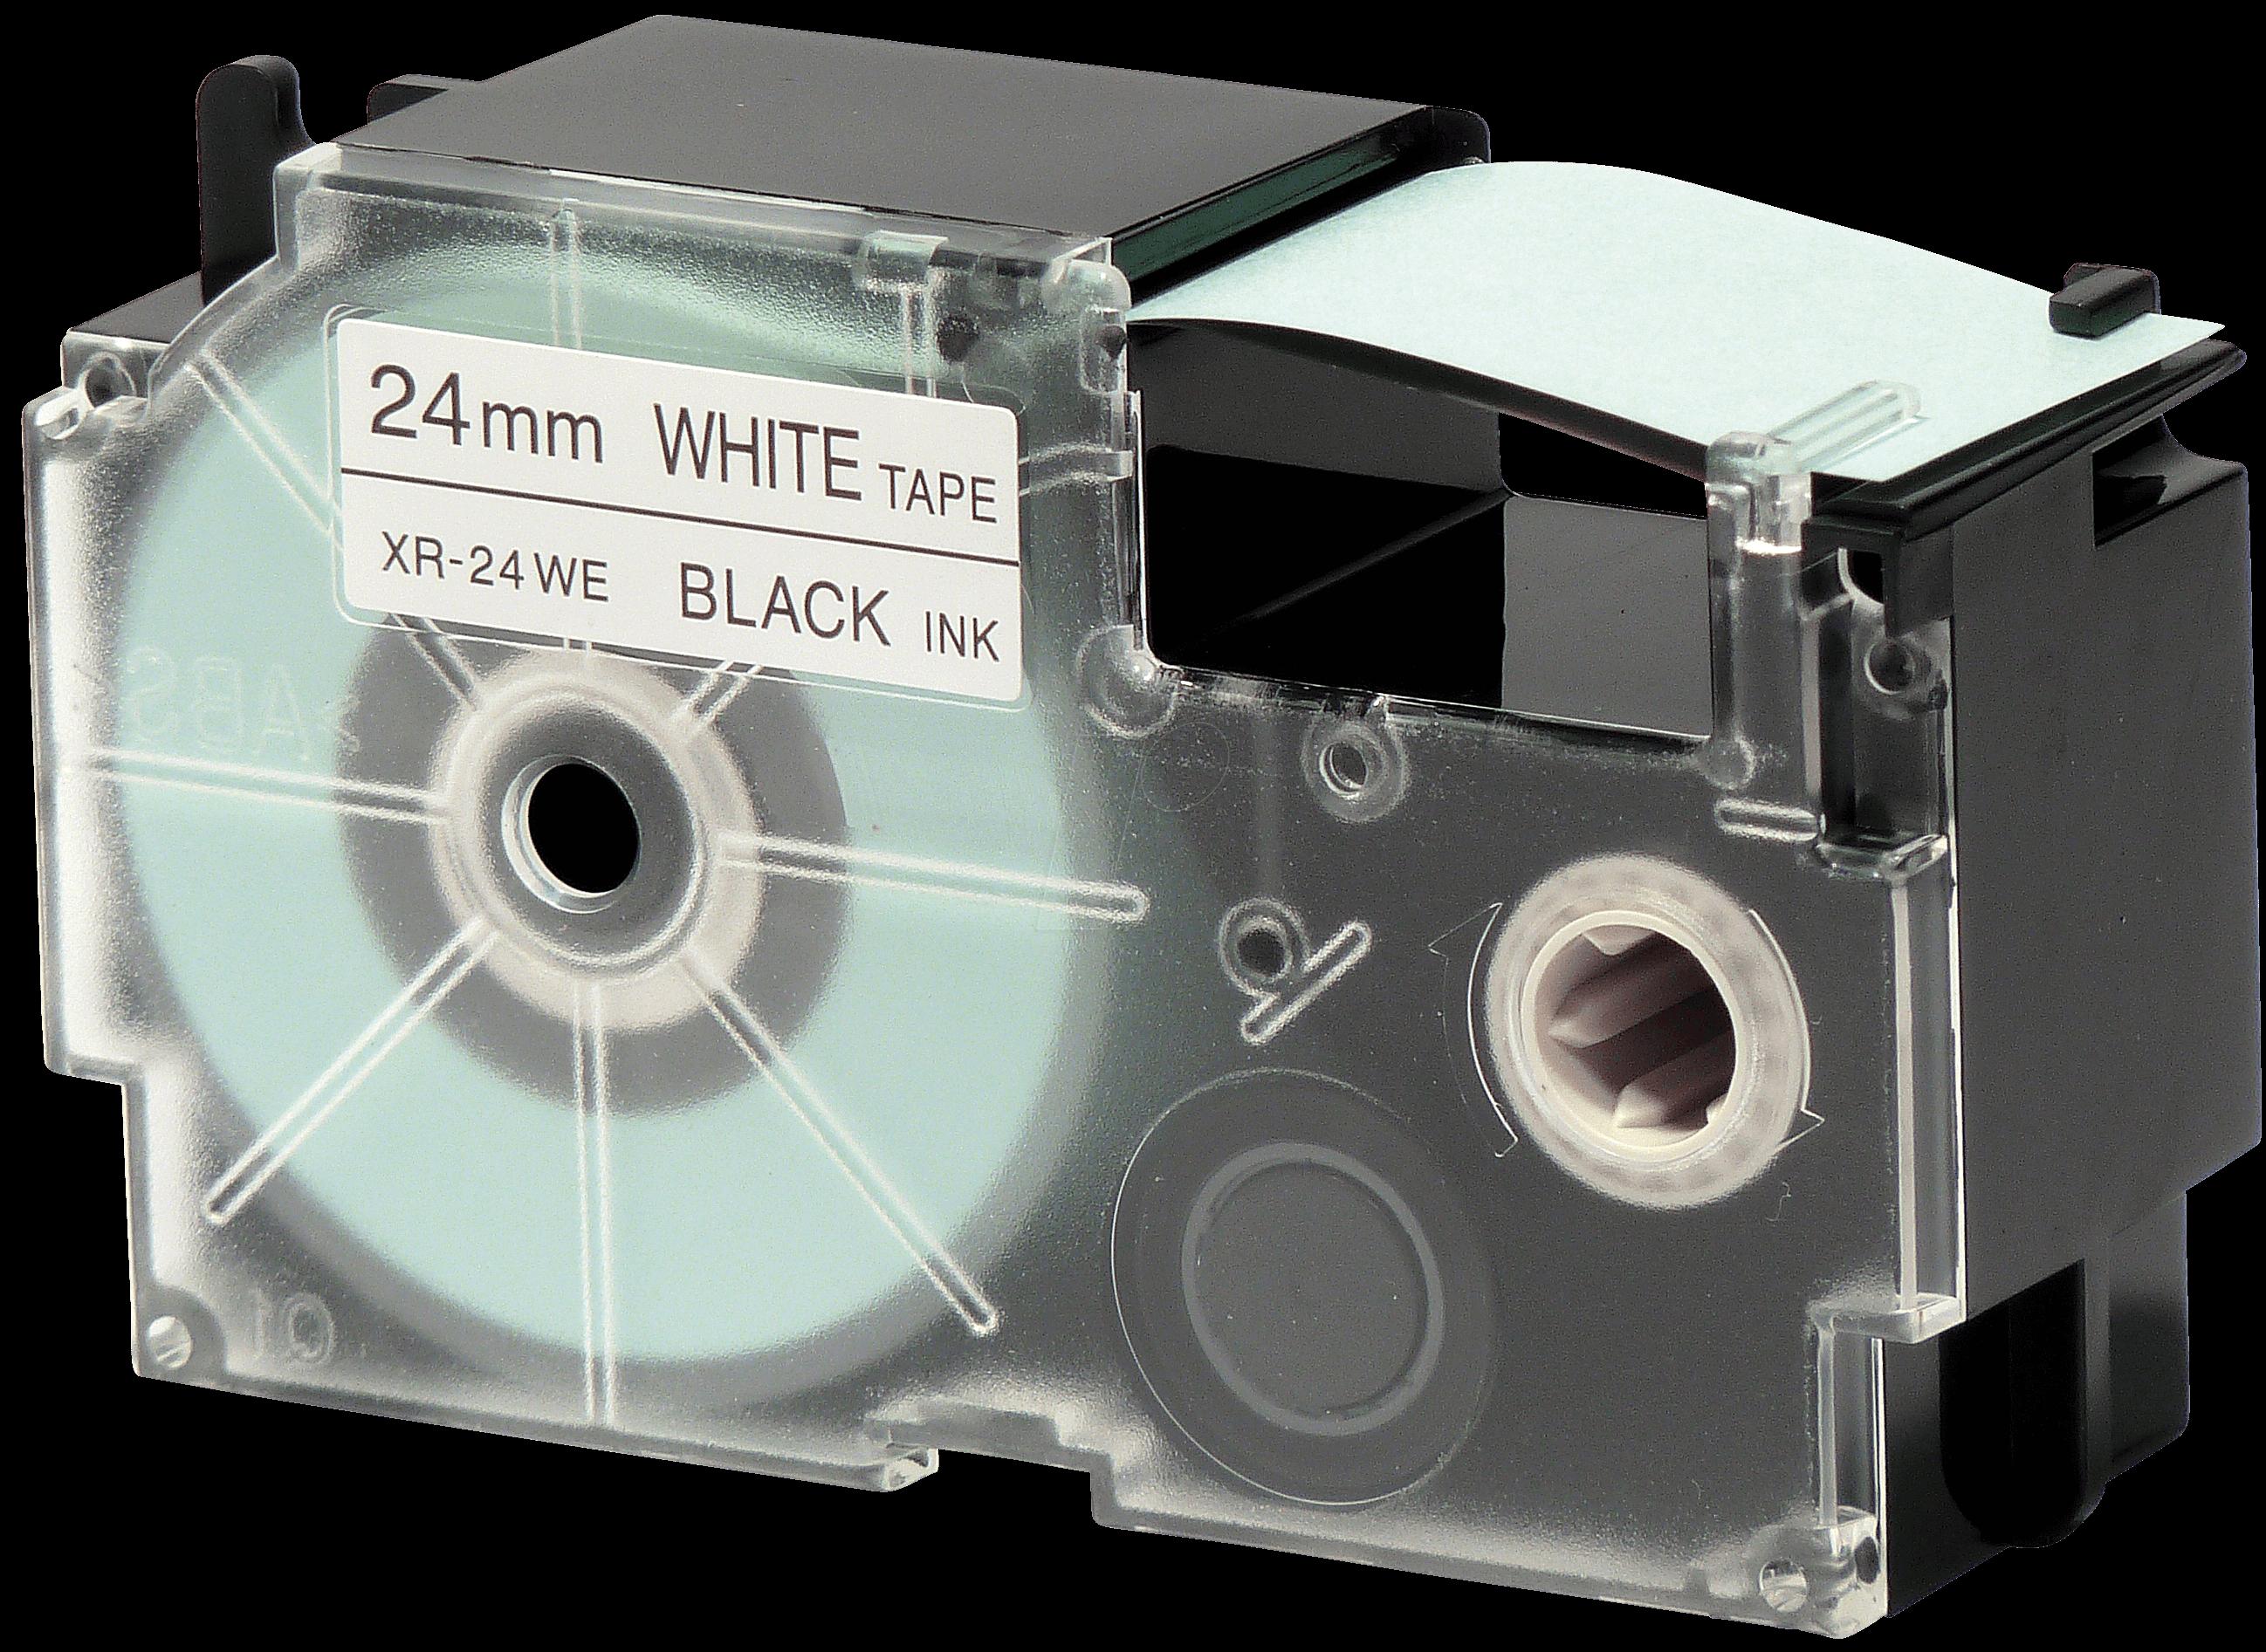 https://cdn-reichelt.de/bilder/web/xxl_ws/F100/CAS_XR-24WE1WHITE_BLACK.png